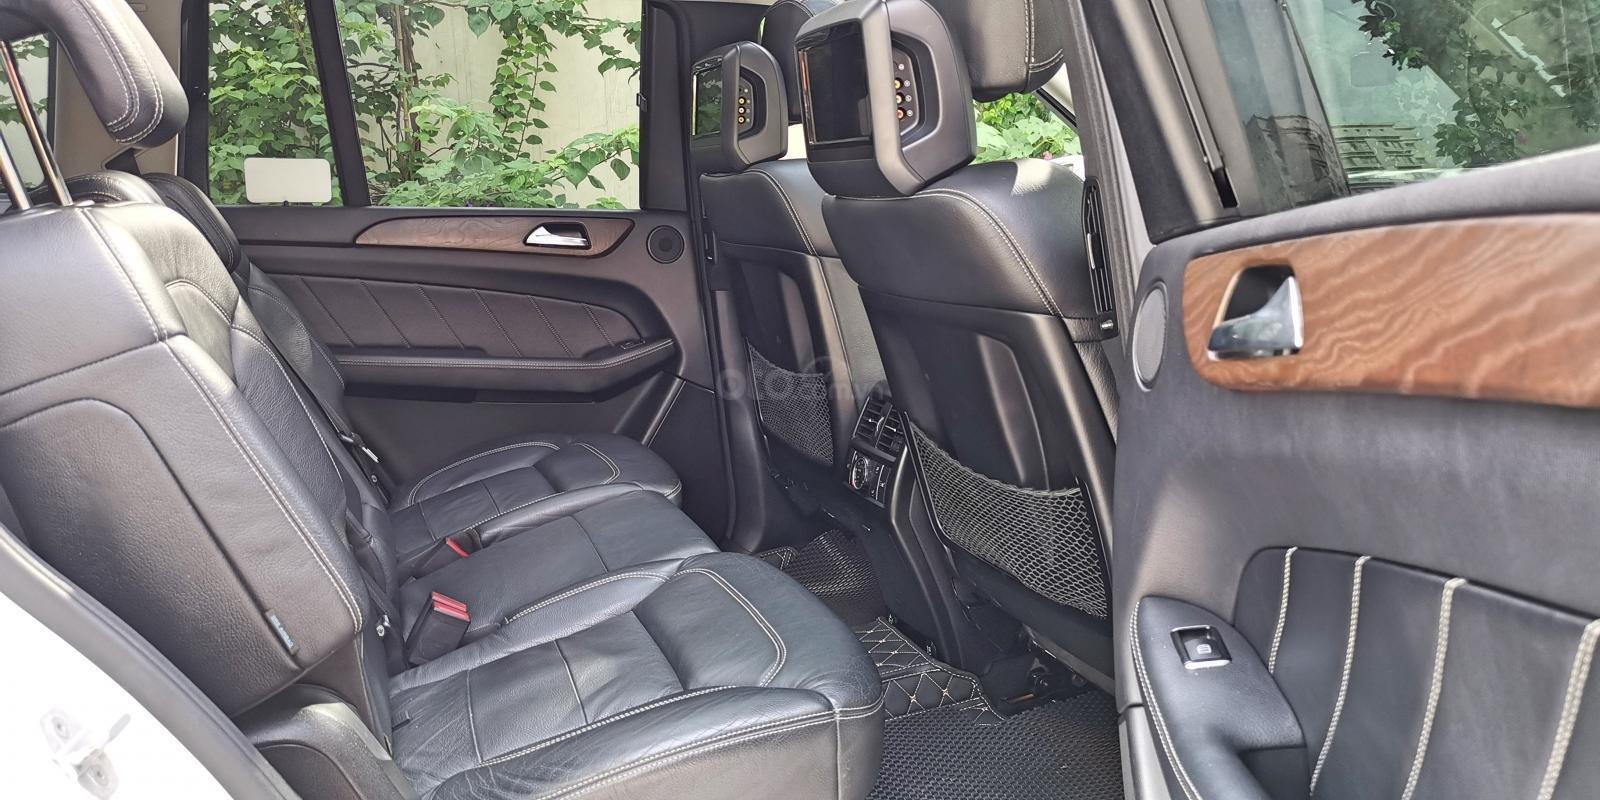 Mercedes Benz GL400 4Matic 2014, xe nhập khẩu nguyên chiếc (7)